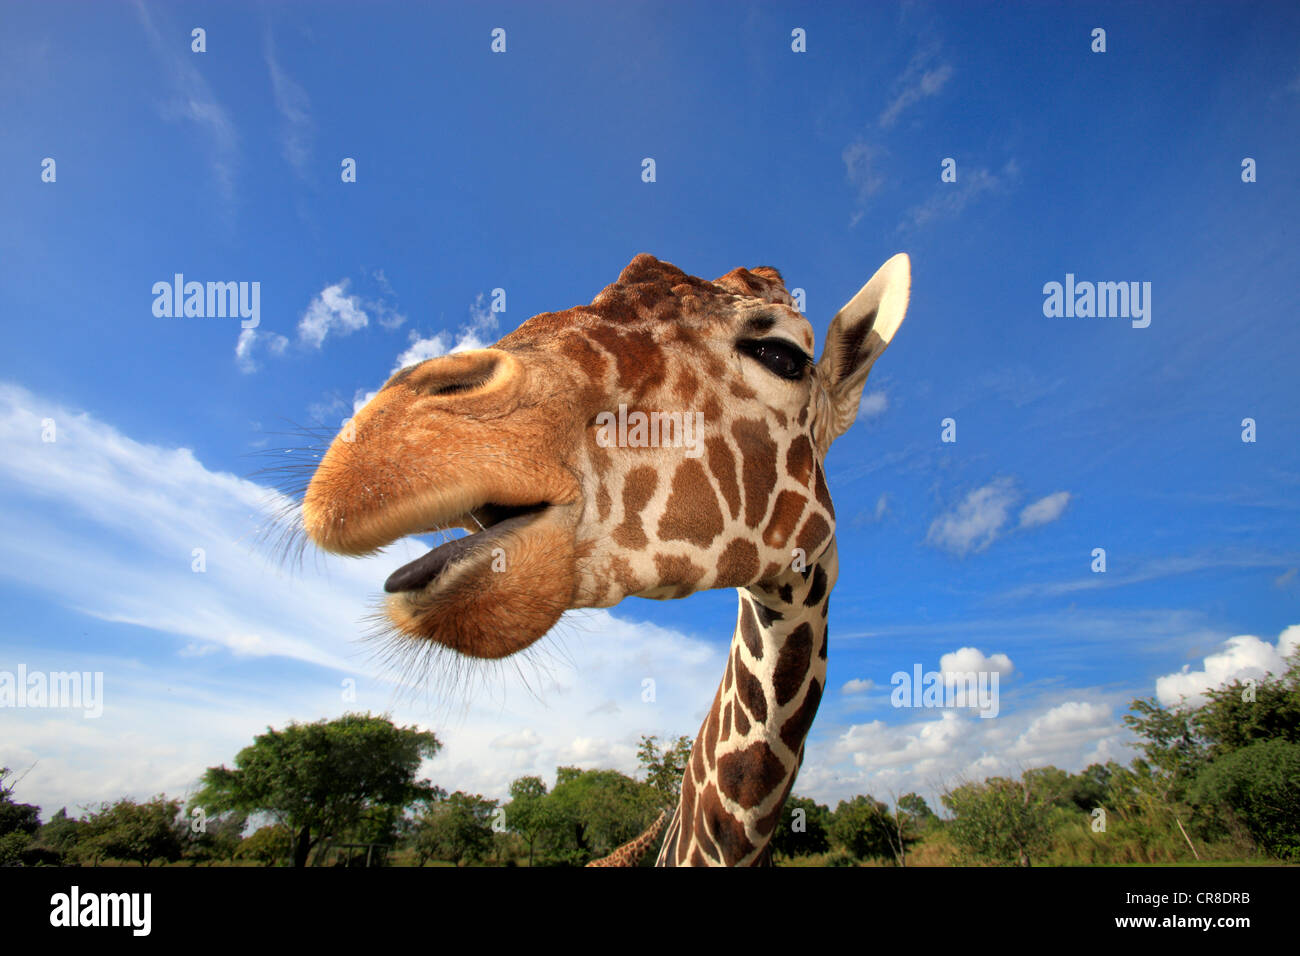 Reticulated Giraffe (Giraffa camelopardalis reticulata), adult, portrait, in captivity, Florida, USA Stock Photo